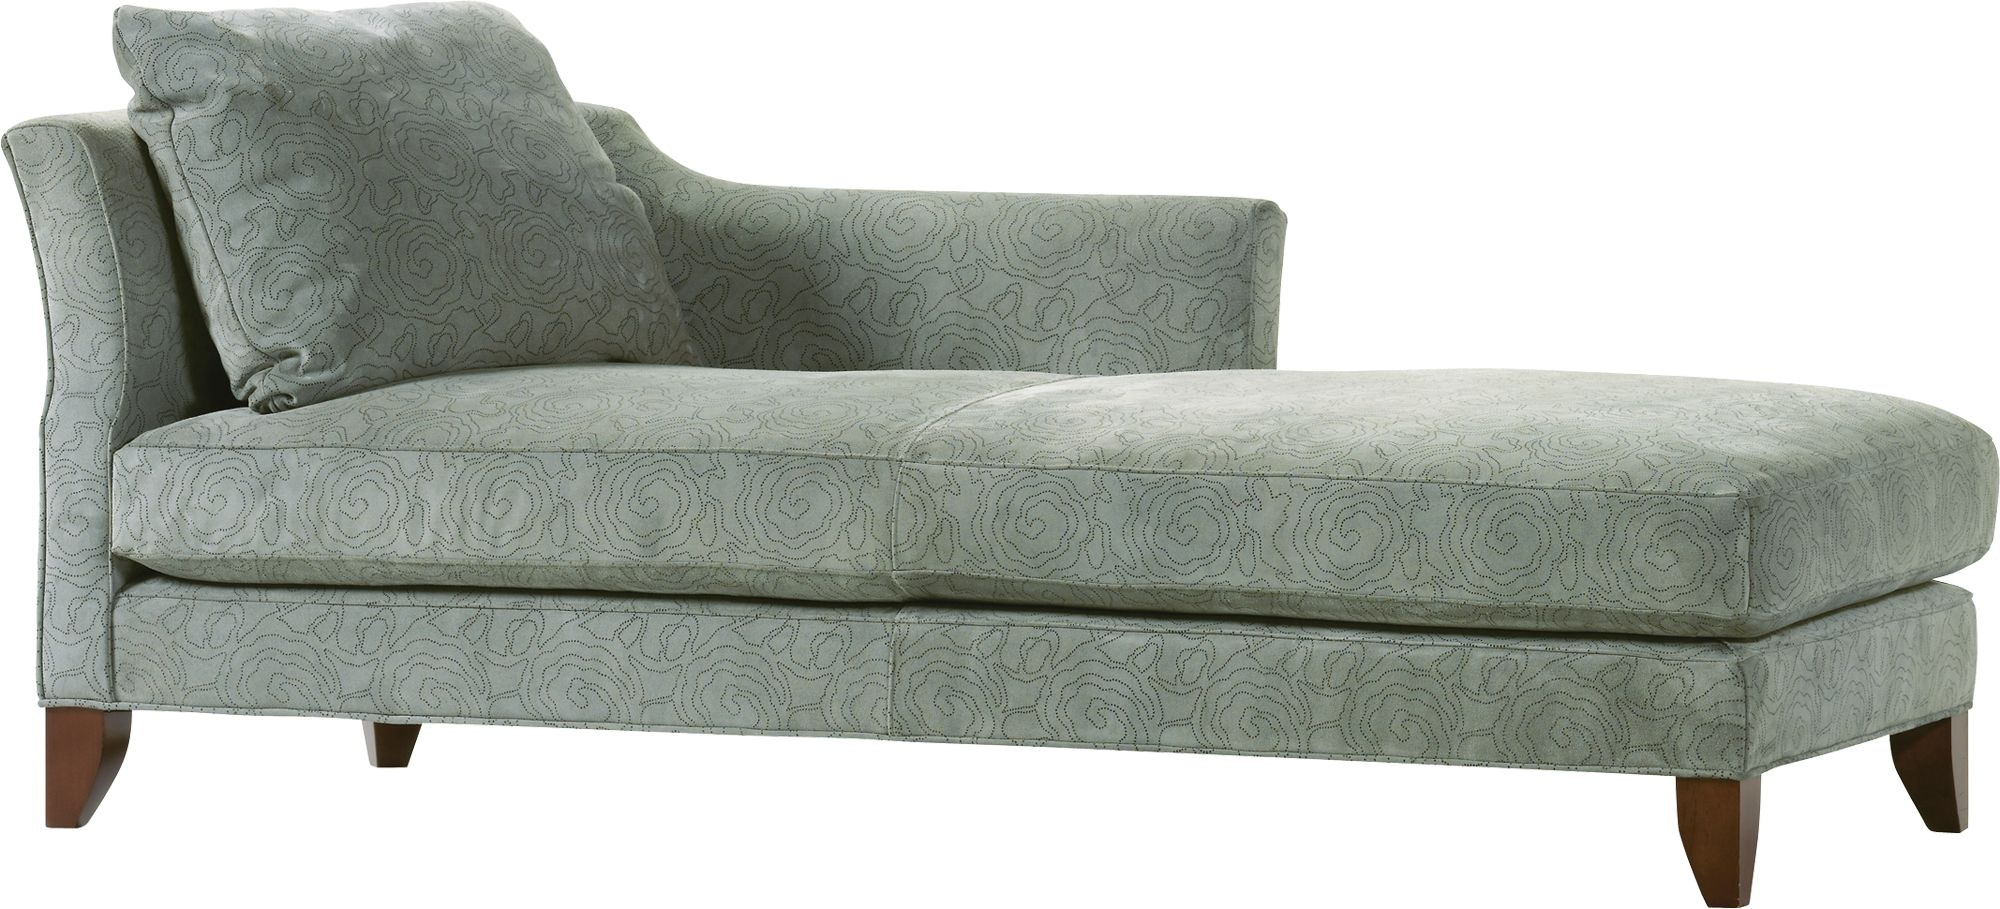 baker furniture 6110cs living room laura kirar baker. Black Bedroom Furniture Sets. Home Design Ideas